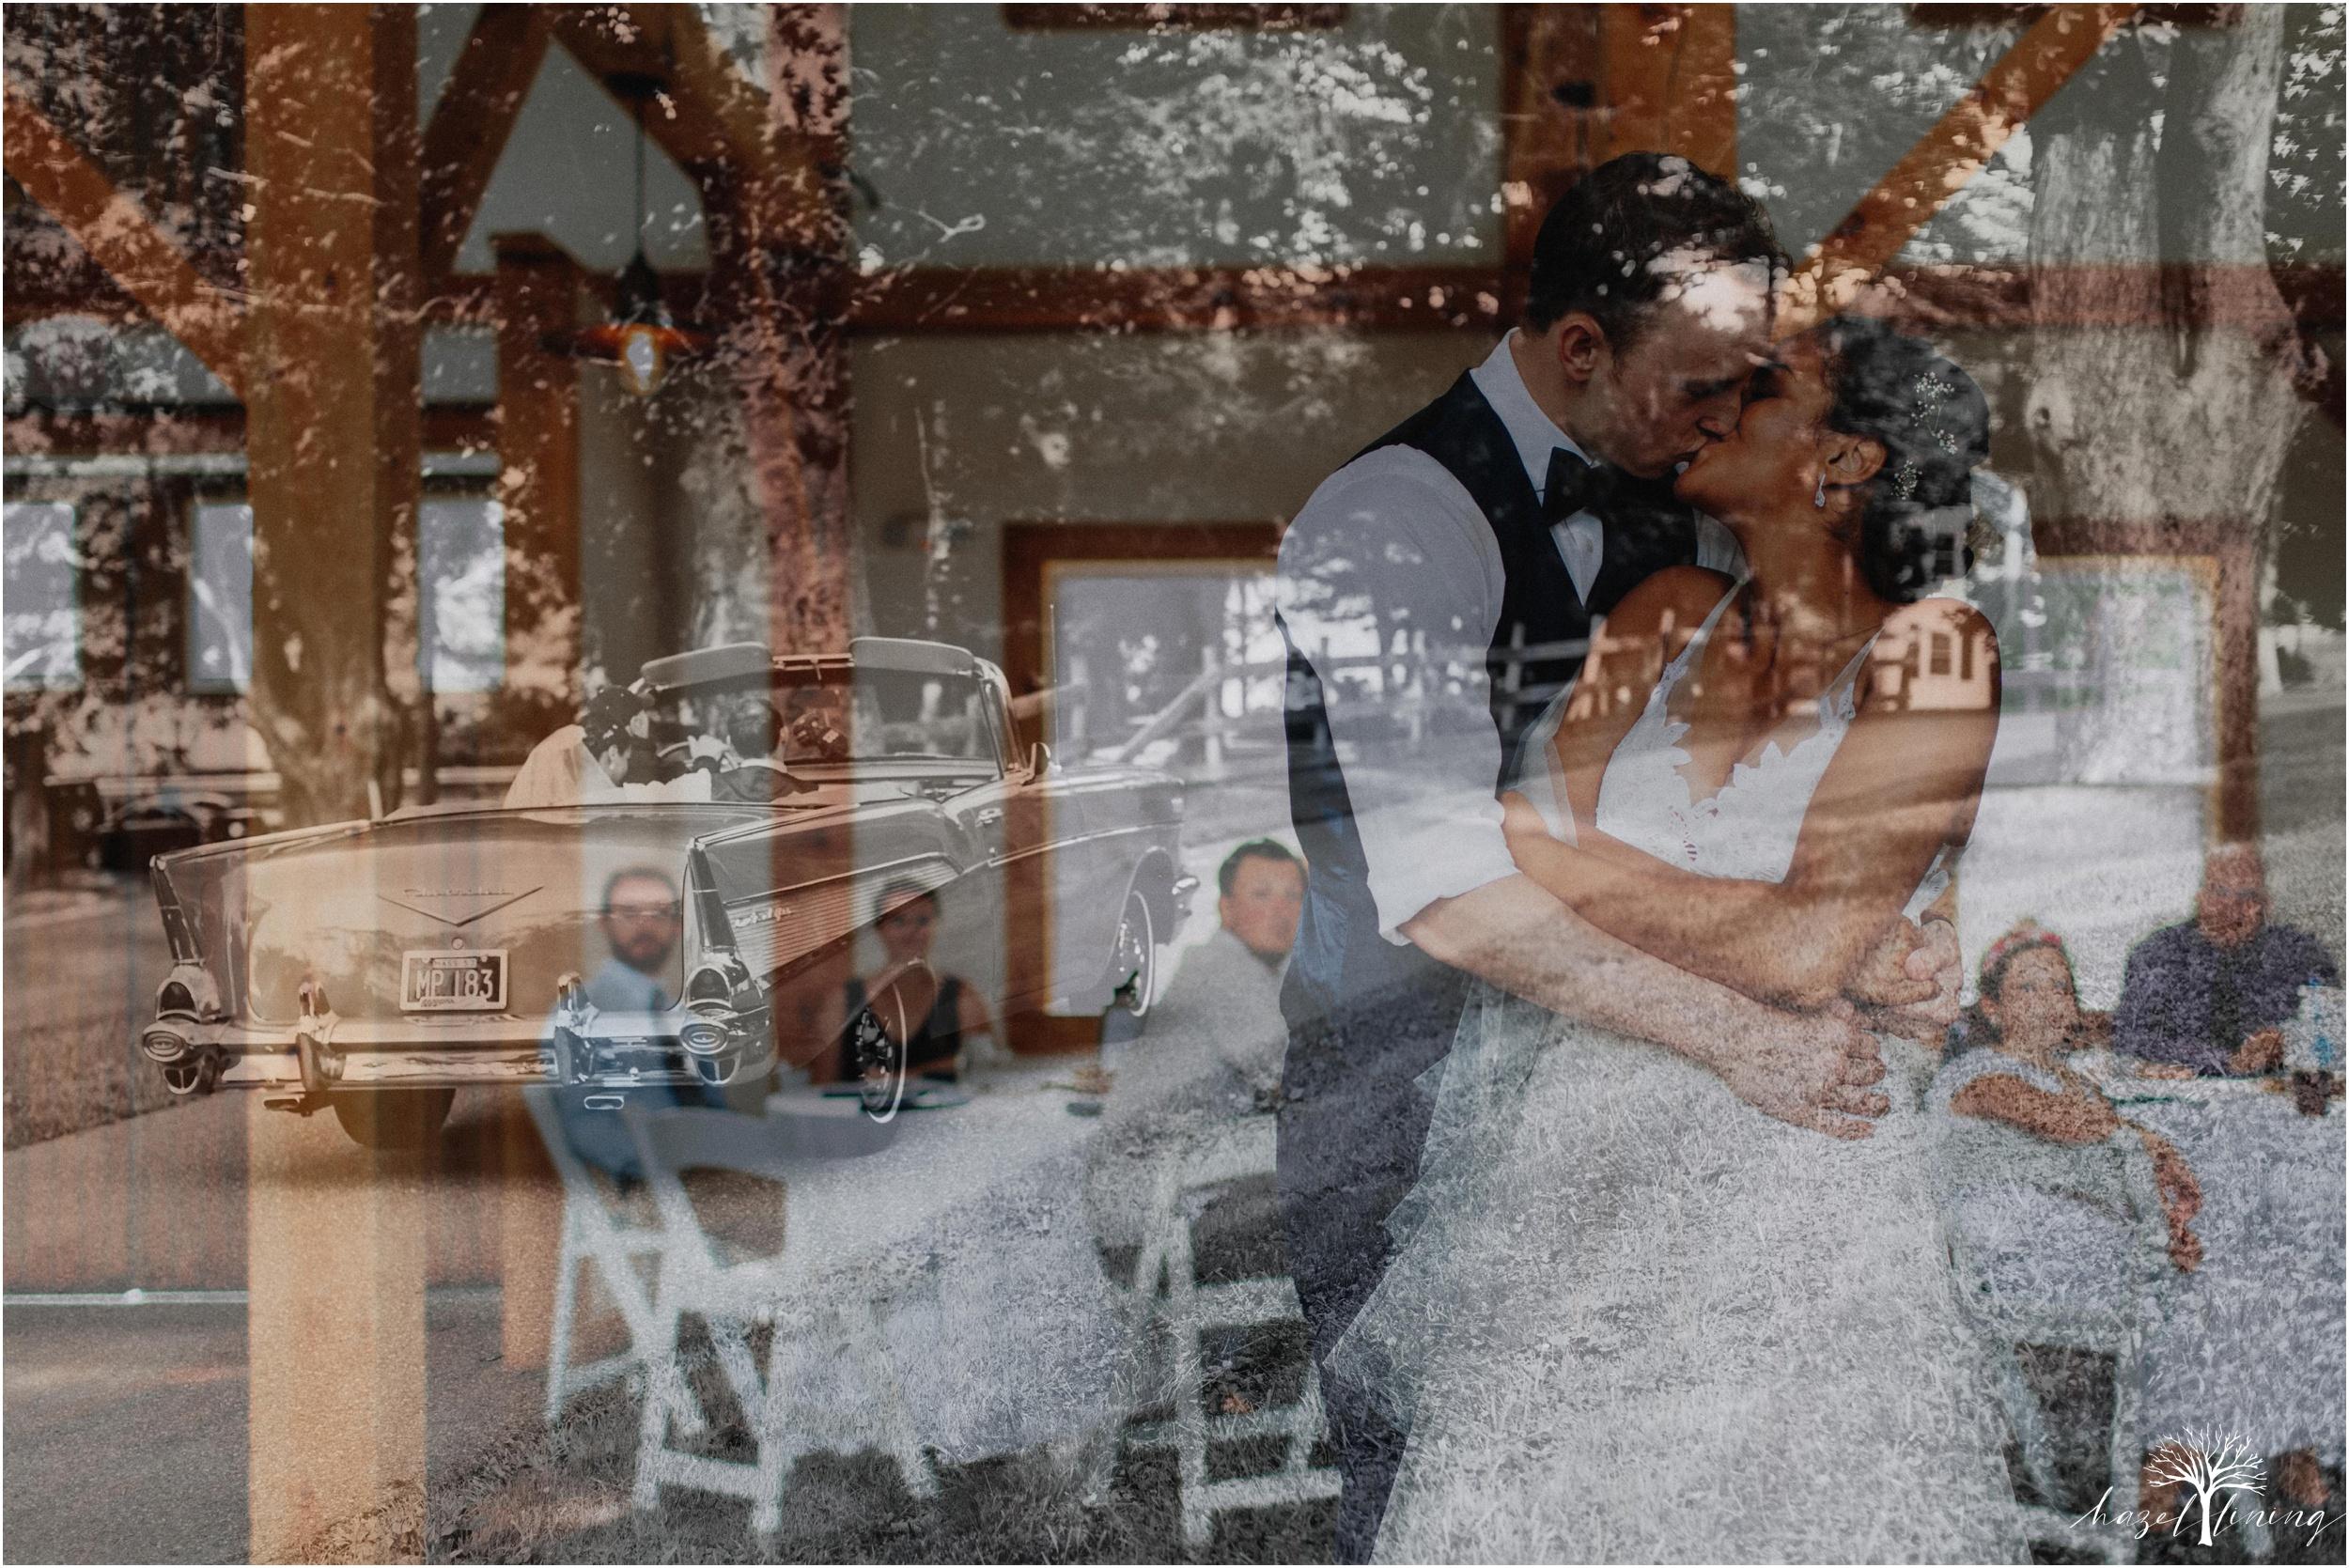 mariah-kreyling-samuel-sherratt-sherrattwiththeworld-peirce-farm-at-witch-hill-boston-massachusetts-wedding-photography-hazel-lining-travel-wedding-elopement-photography_0212.jpg